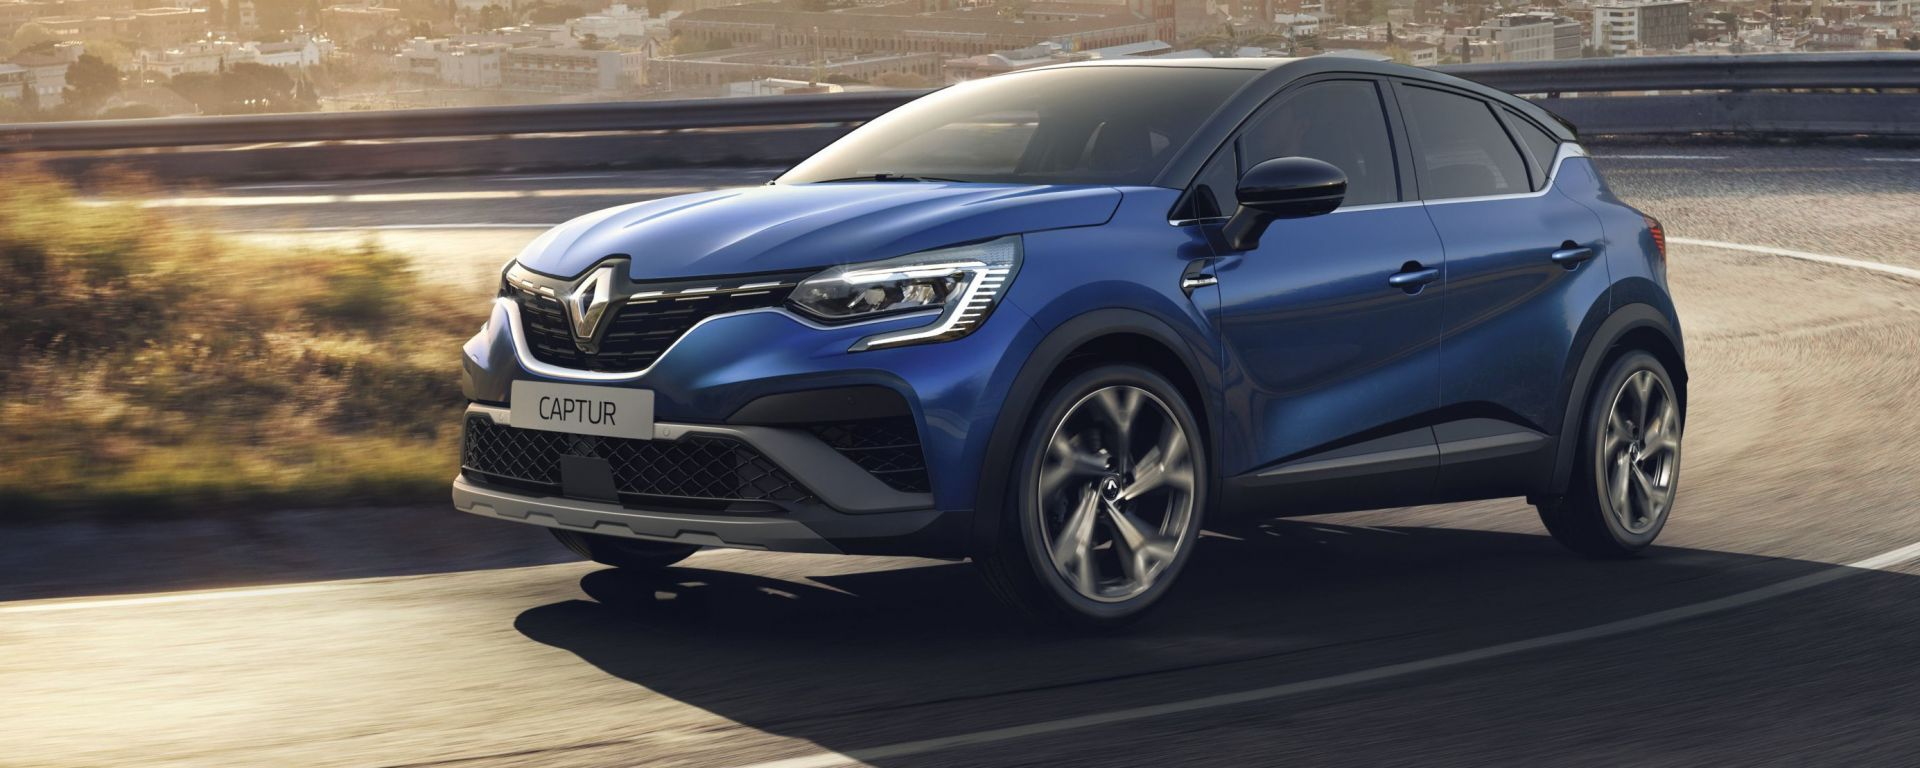 Renault Captur, arriva ibrido e R.S. Line